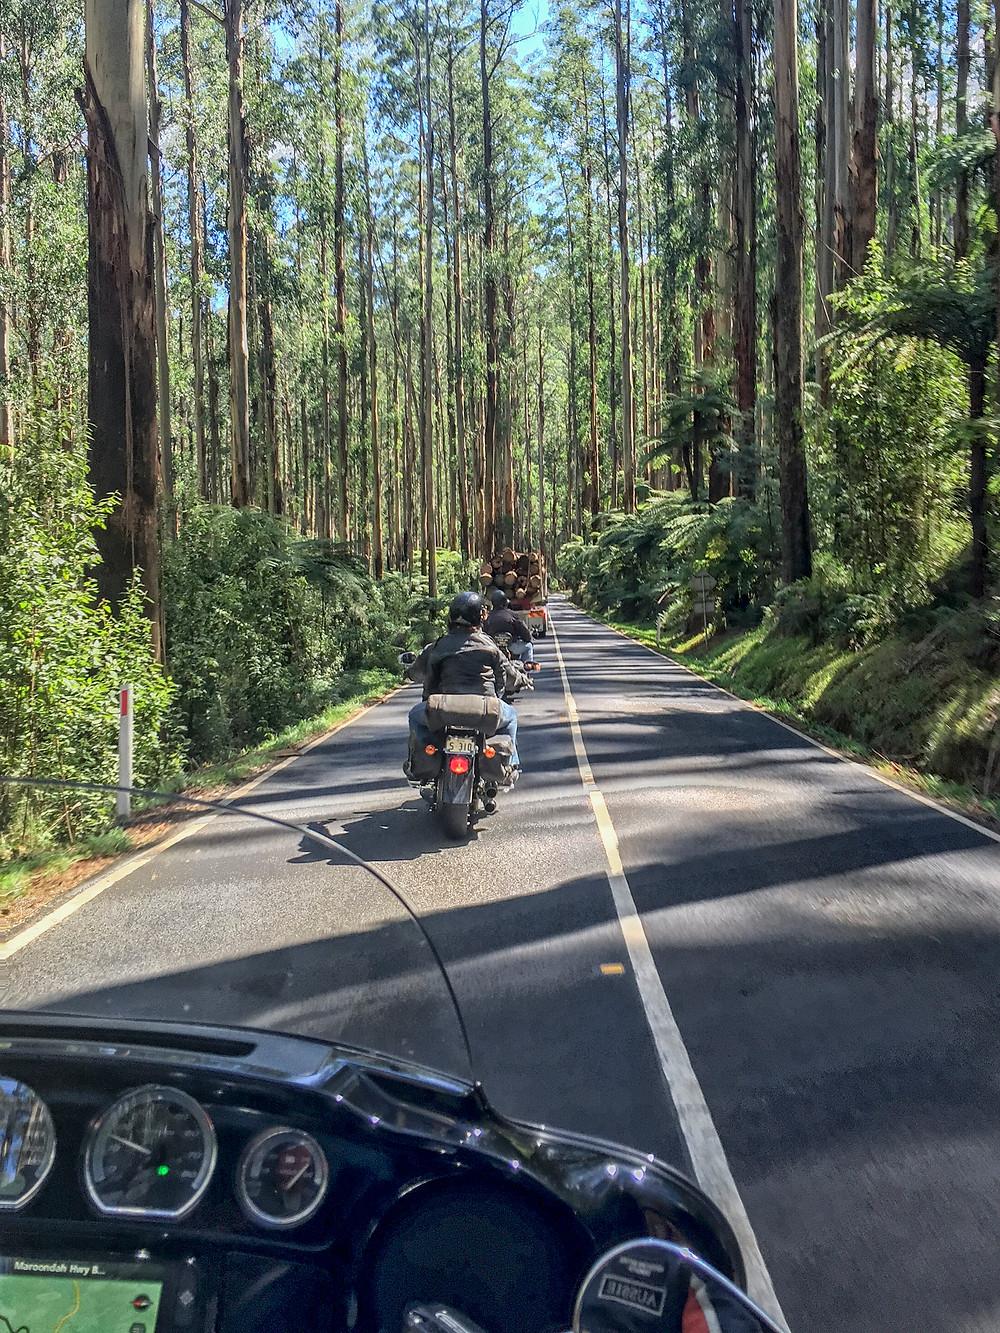 The Black Spur outside Melbourne is a greta Harley Davidson Ride